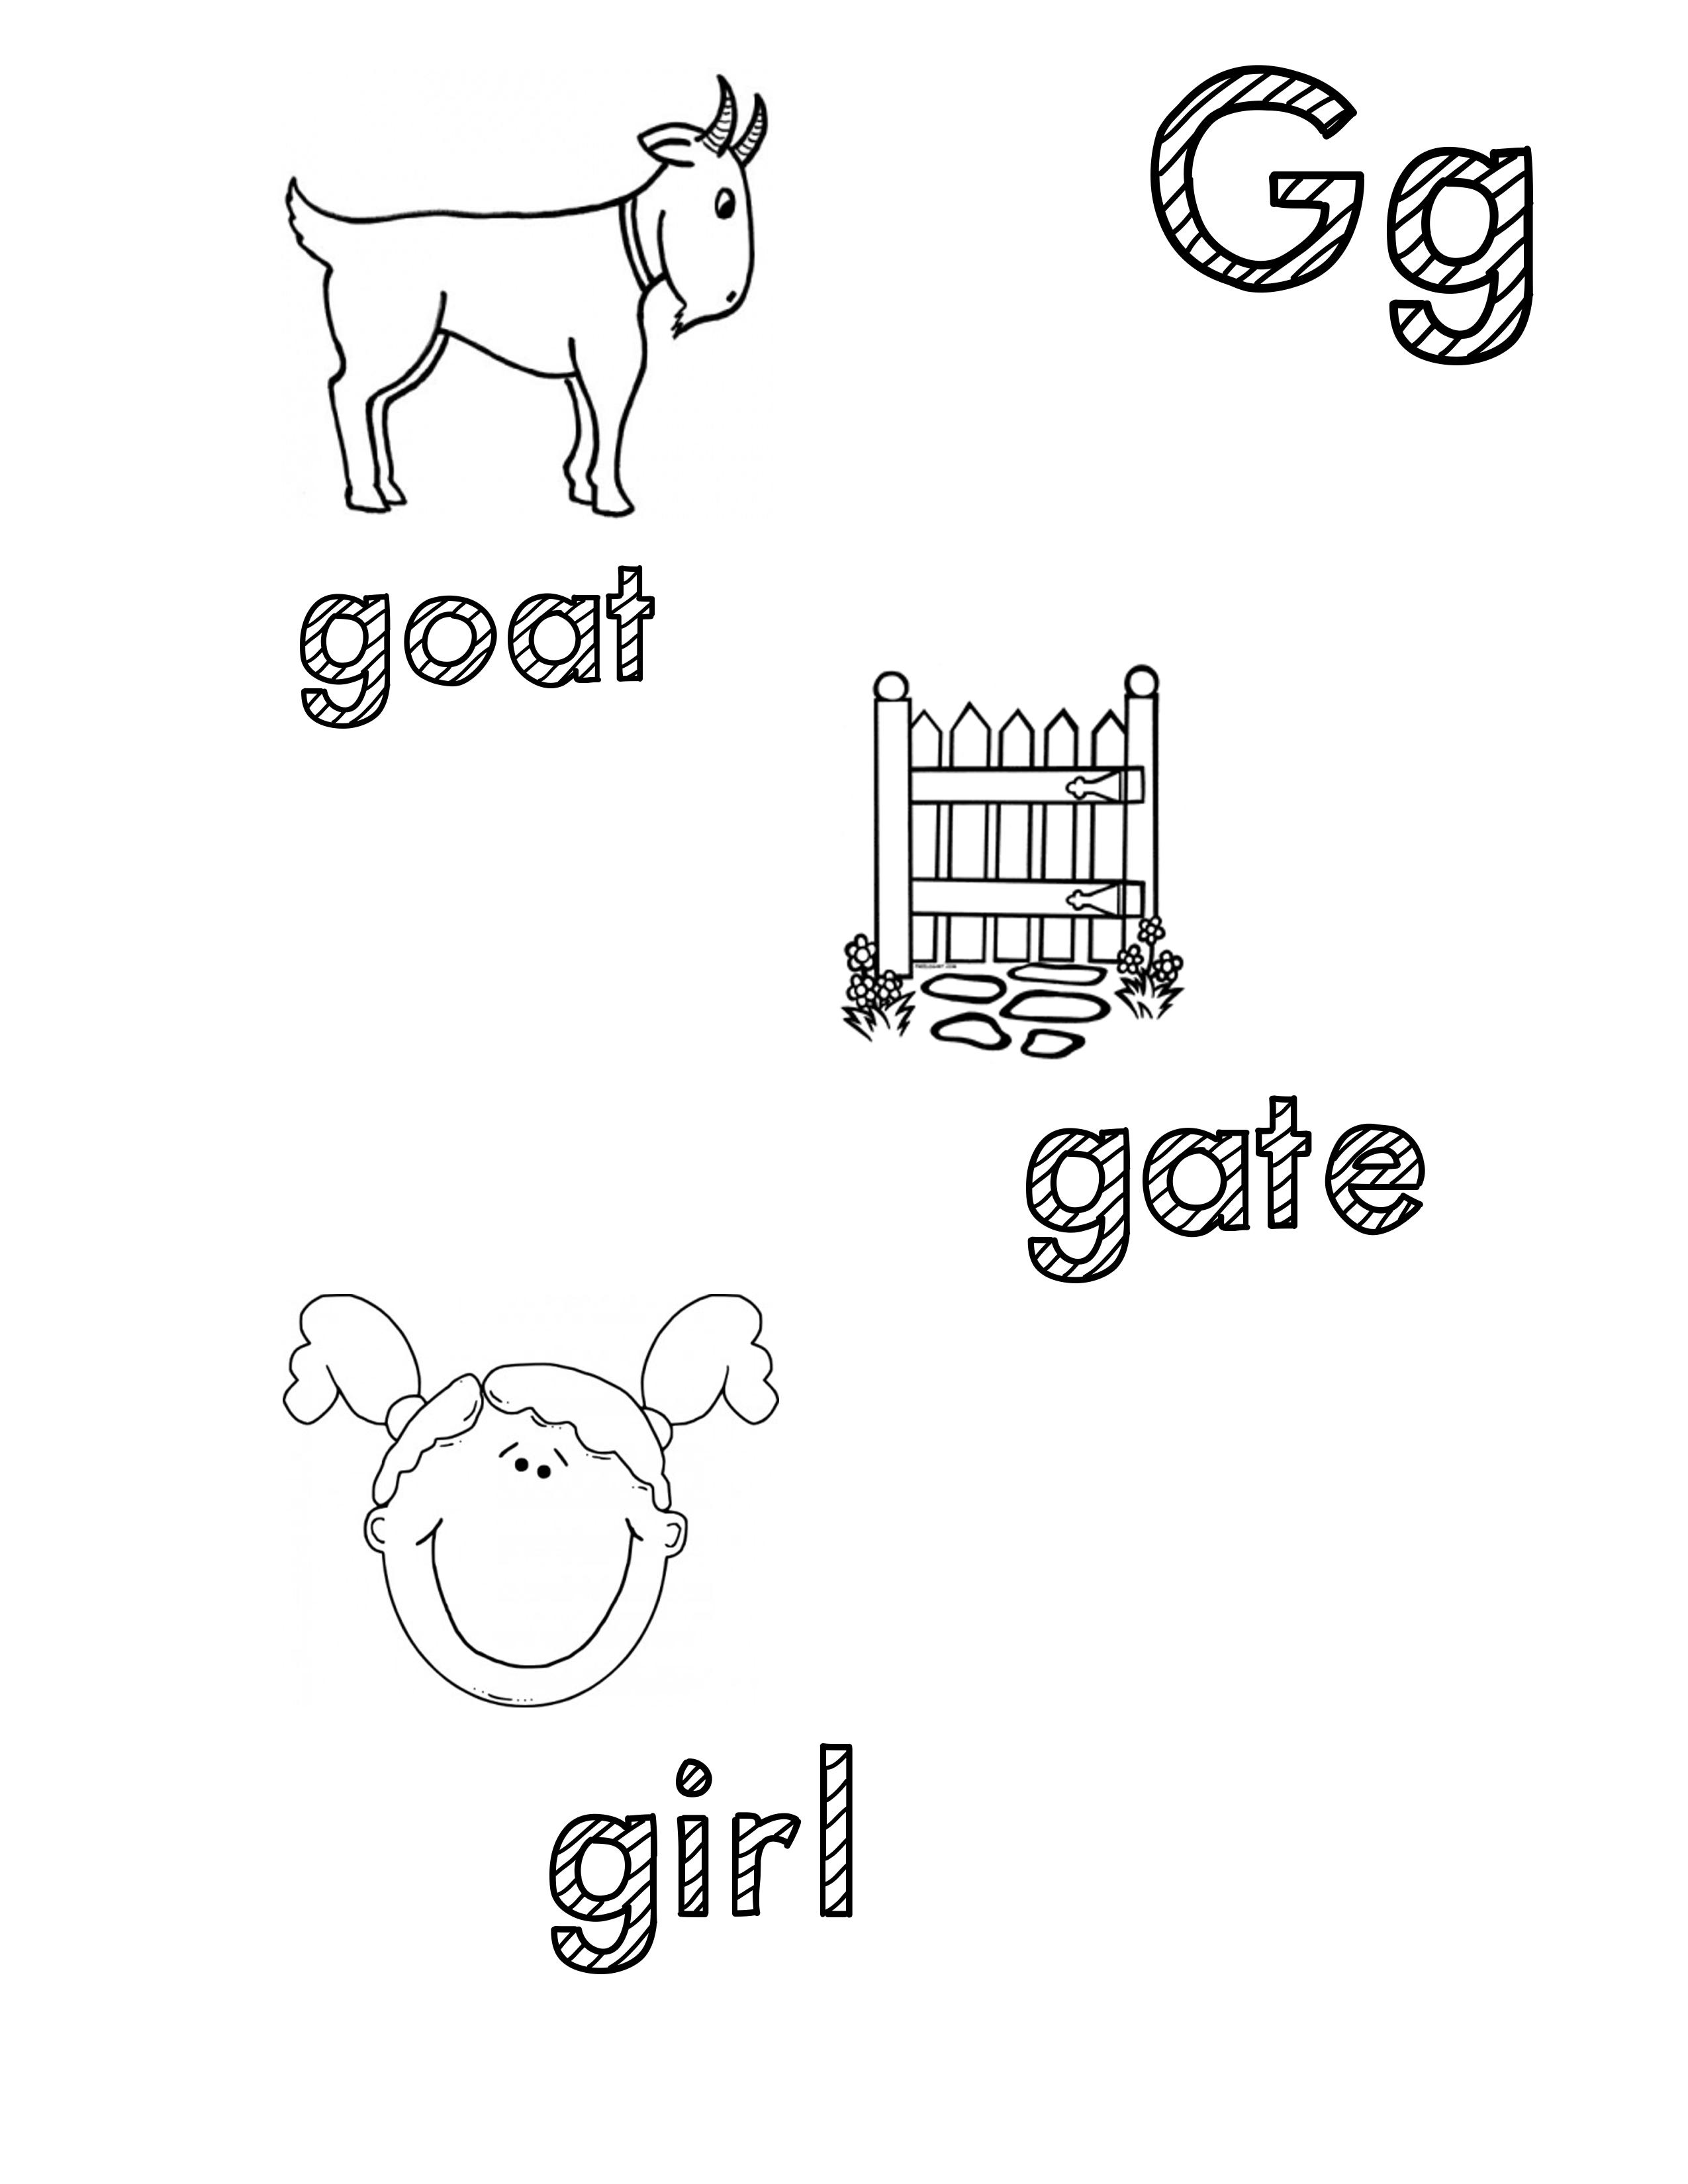 Phonetic Gg Coloring Sheet